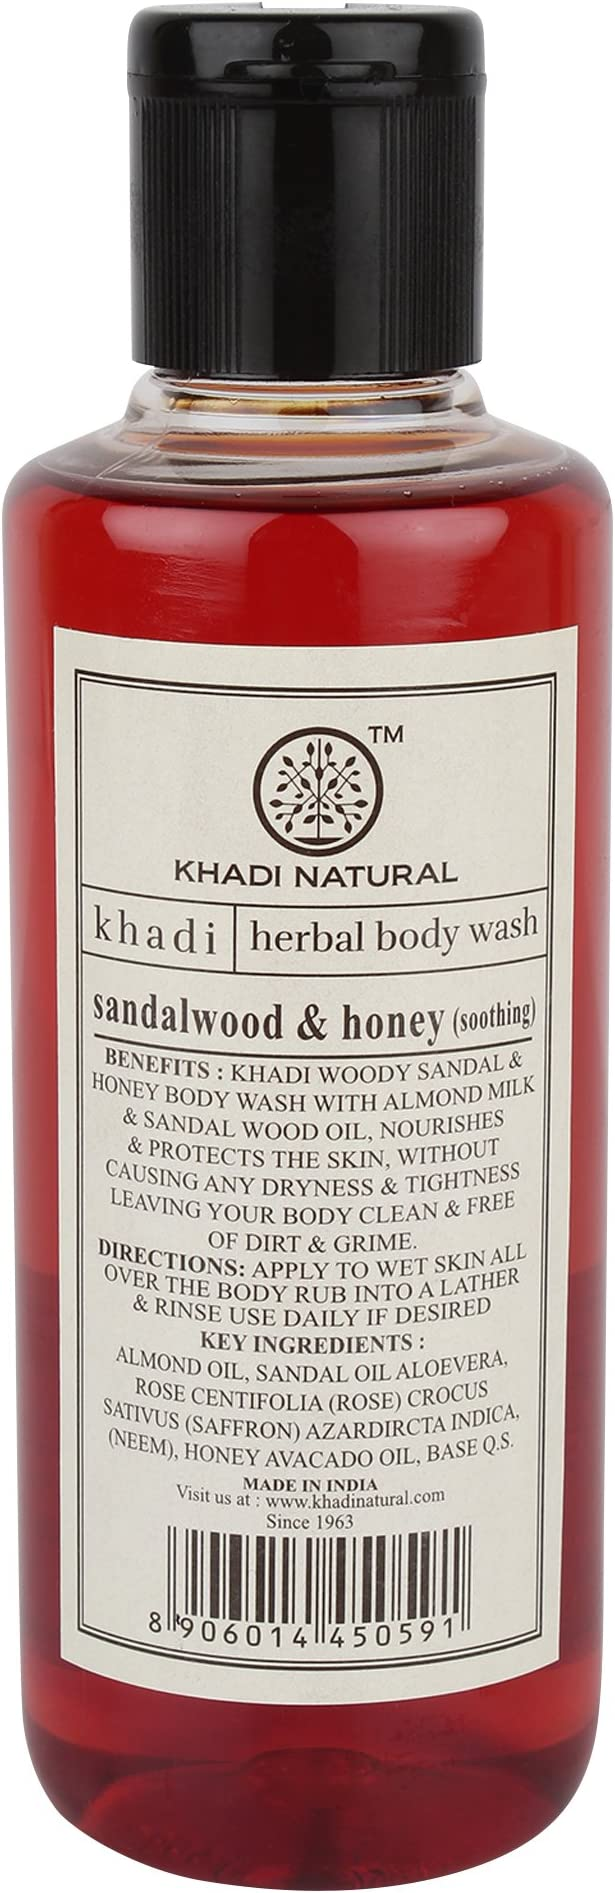 Khadi Sandalwood & Honey Body Wash